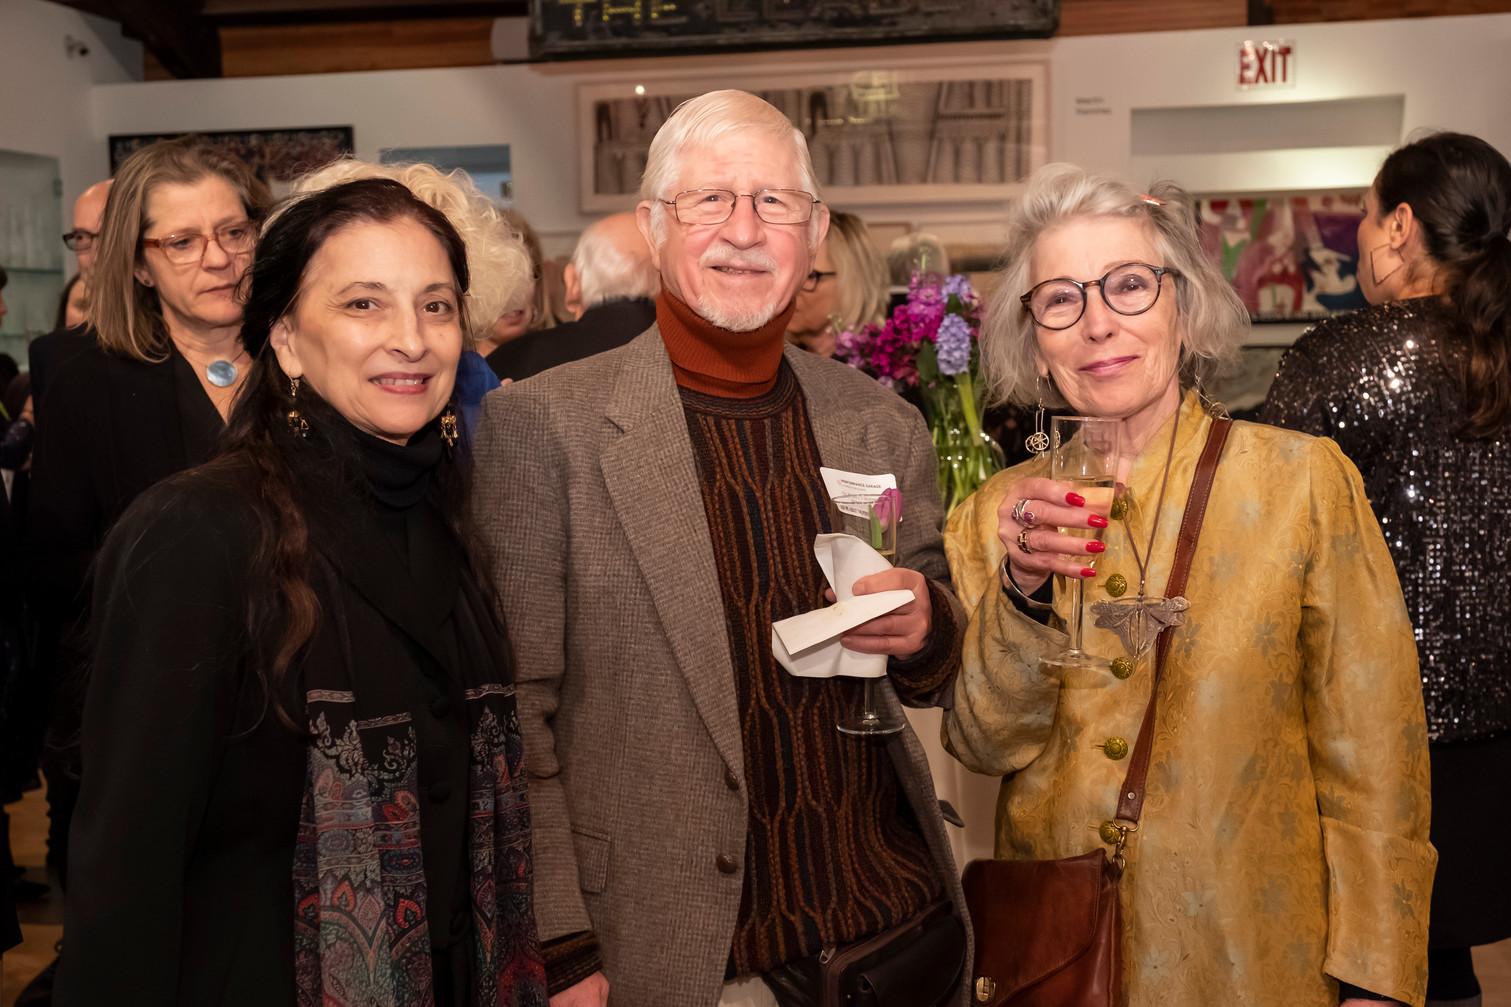 Jacqulyn Buglisi, Dr RJ Wallner, Michele Haines